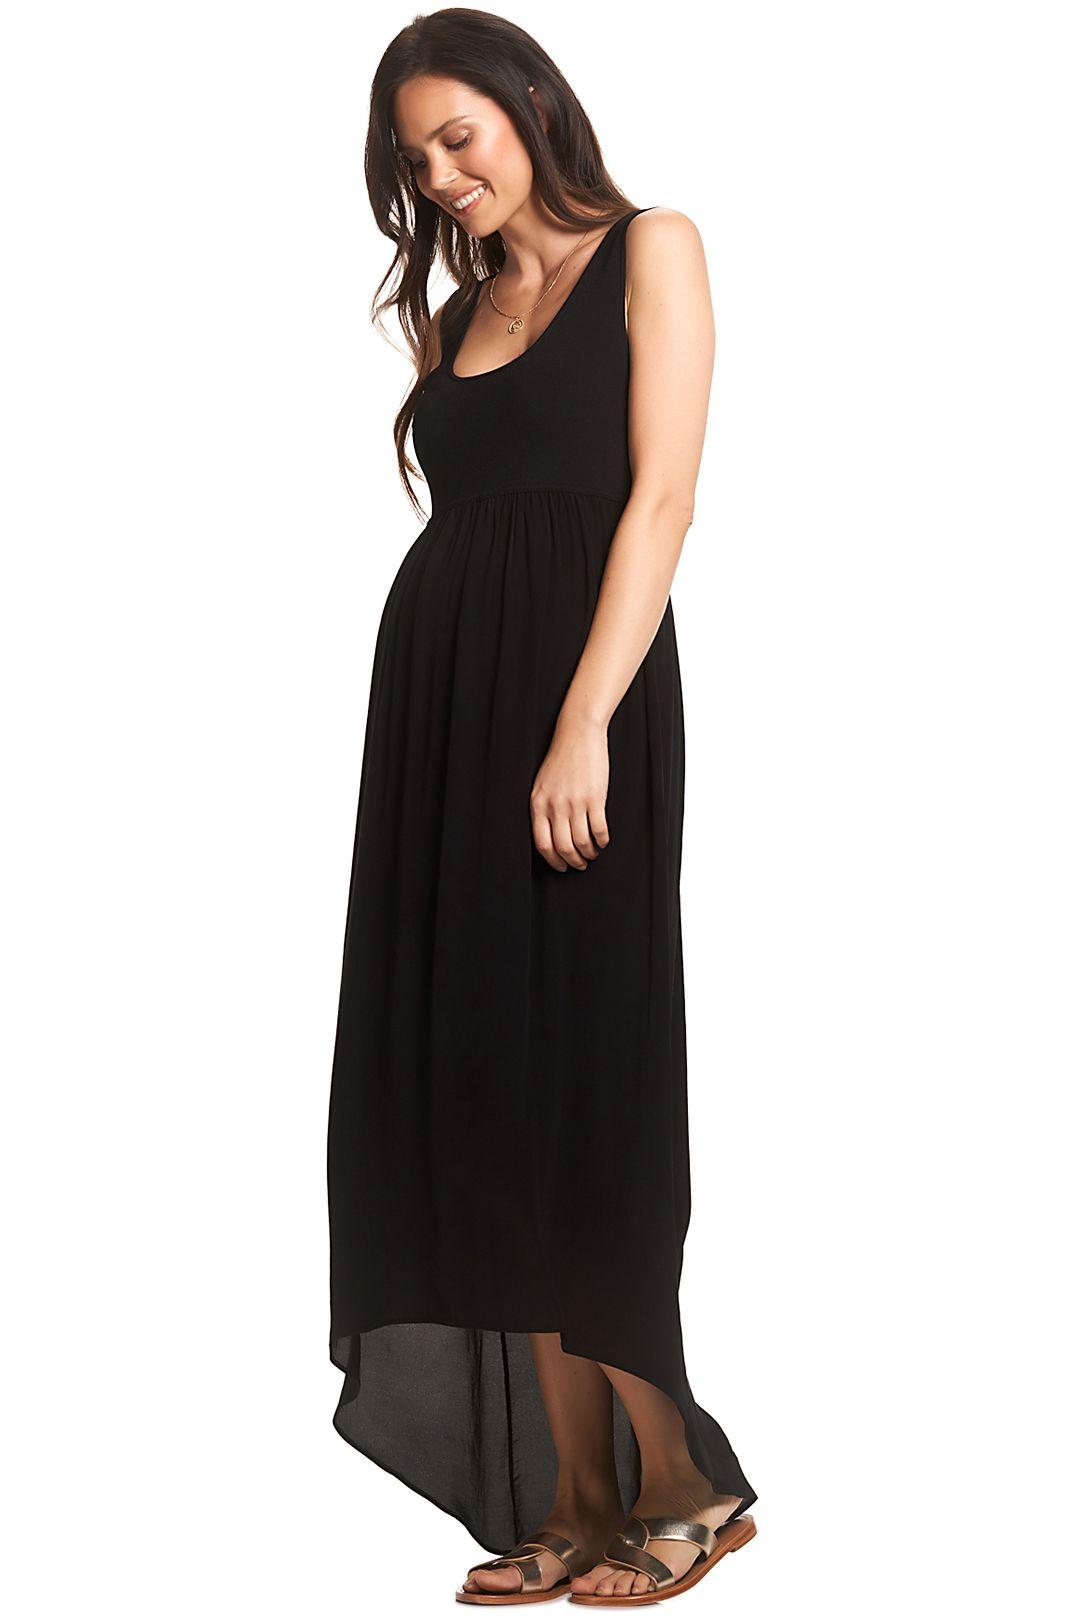 Soon-Maternity-Sia-Maxi-Dress-Black-Side